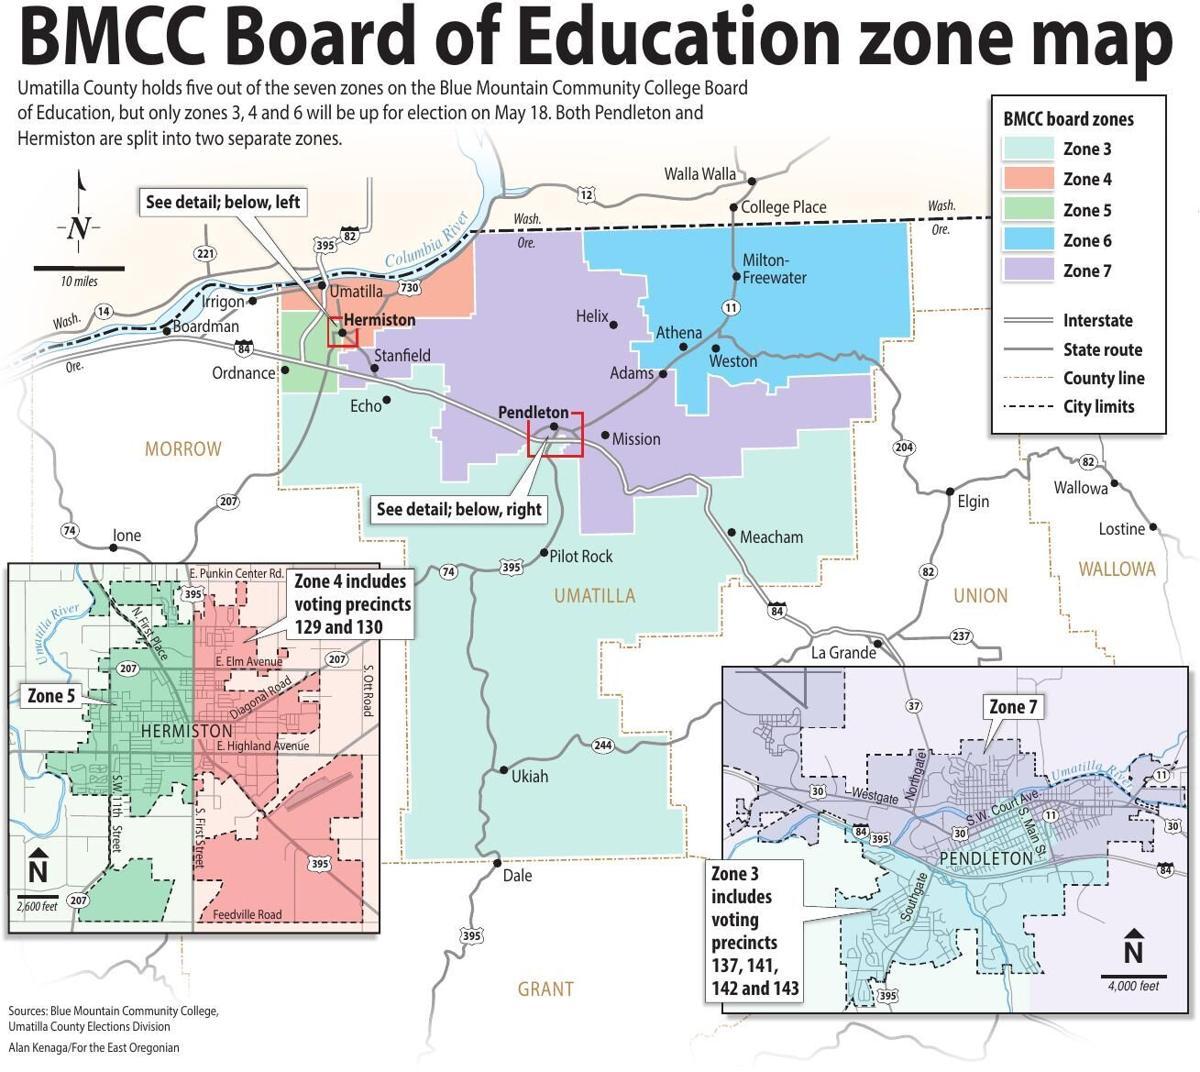 BMCC Board of Education zone map